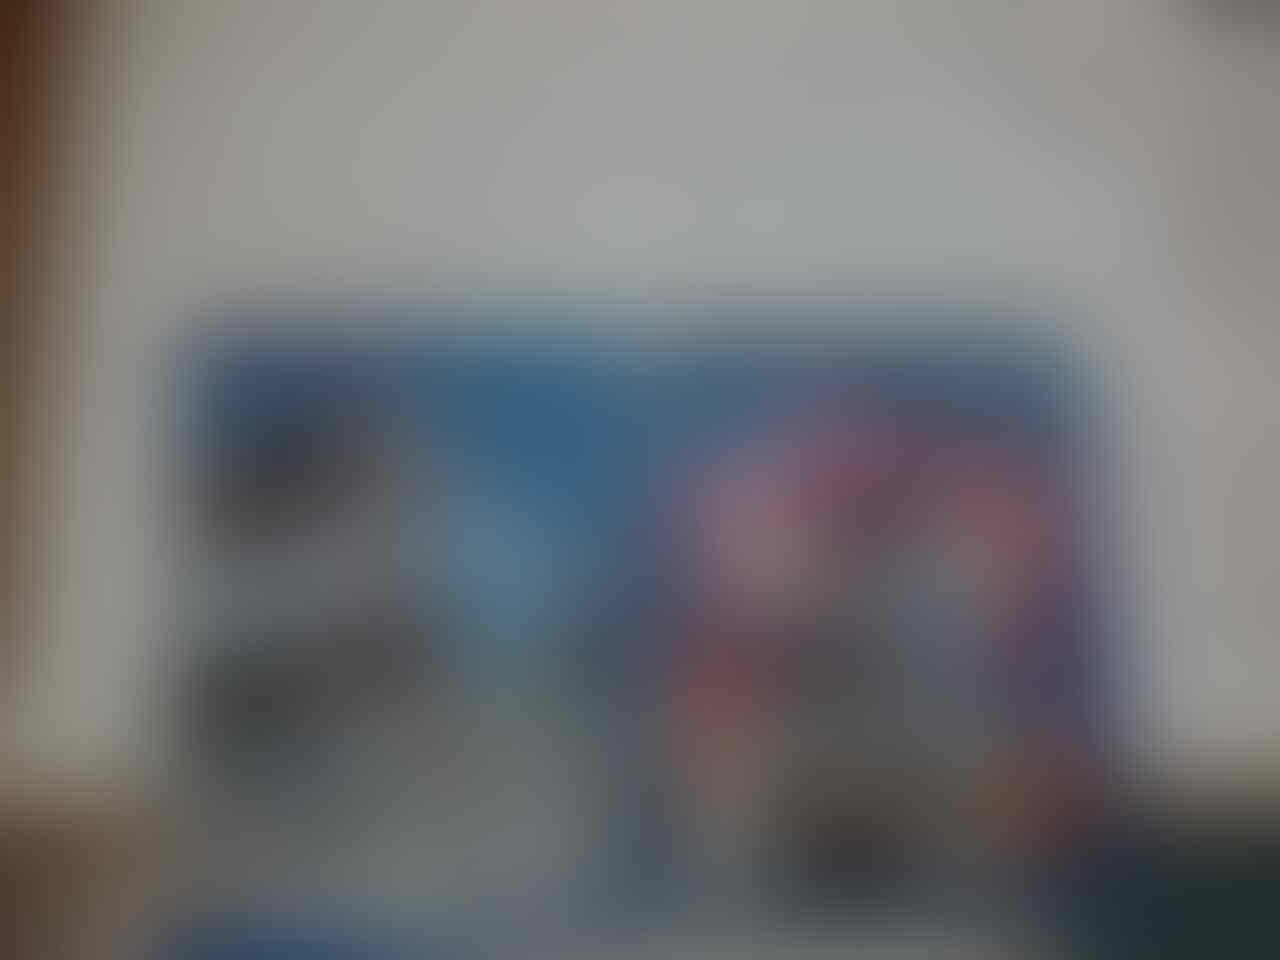 Arena Barter Game Playstation Vita (ORI) - Part 1